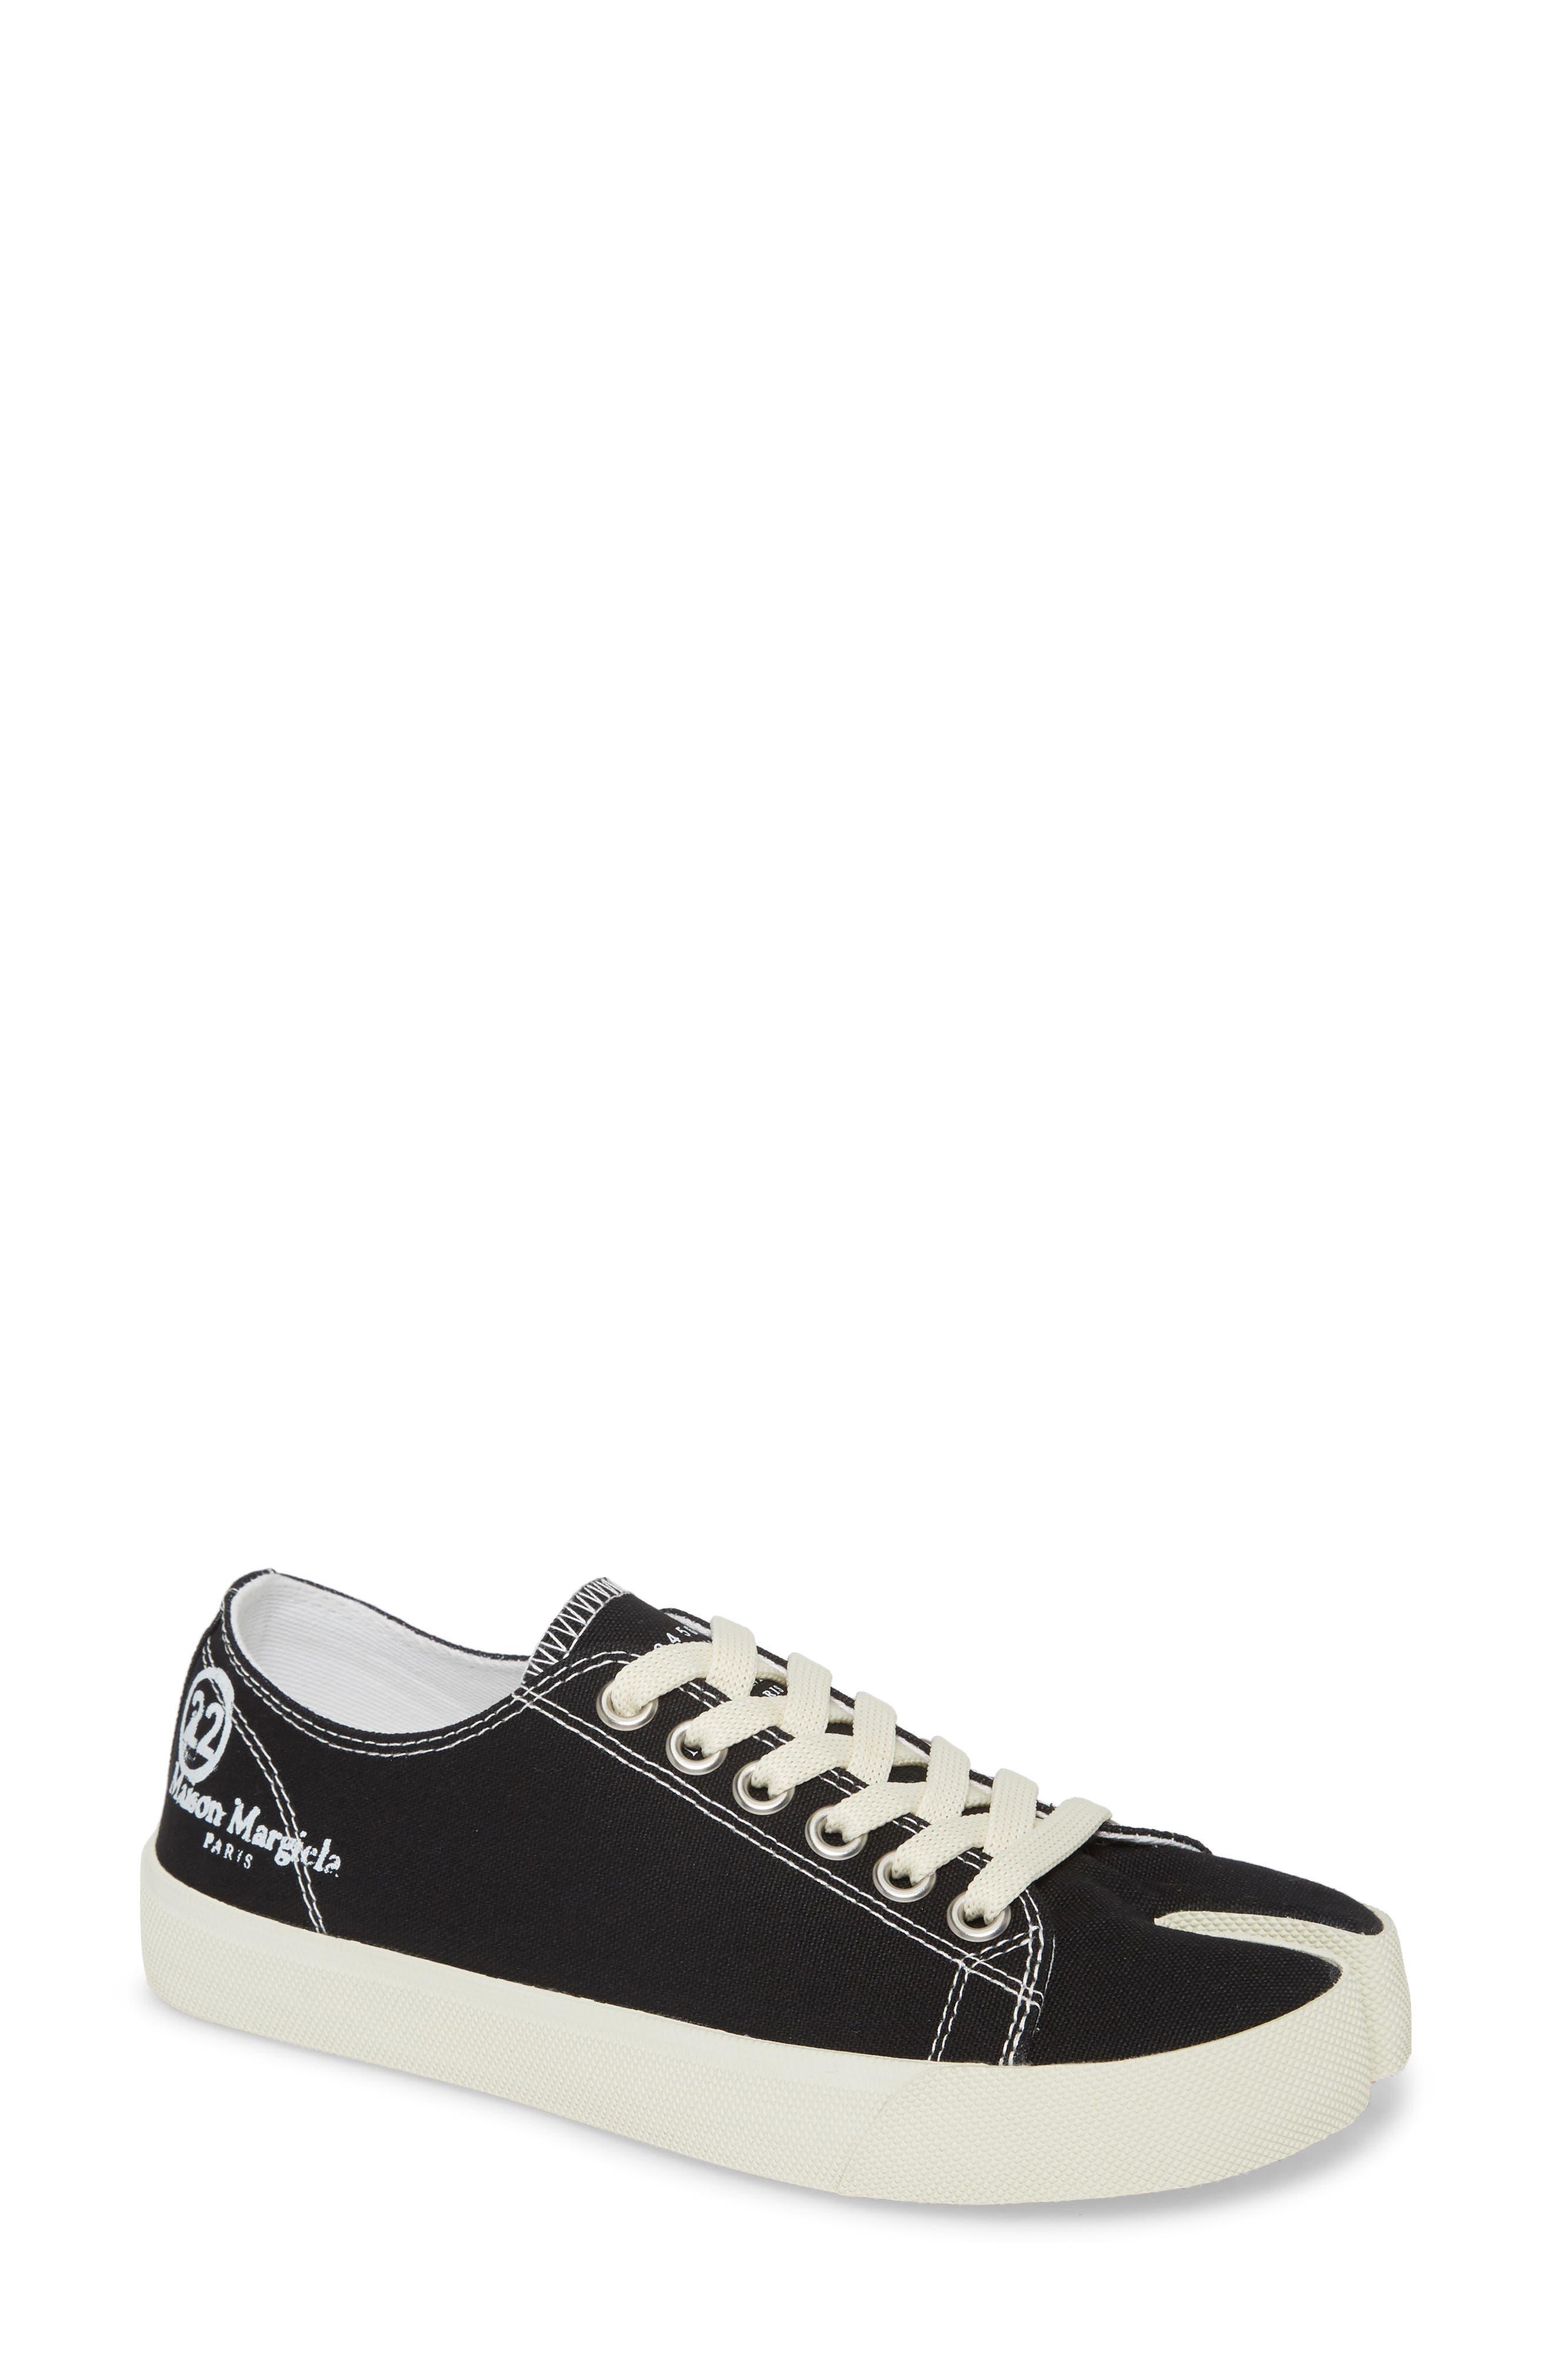 maison margiela tabi sneakers womens